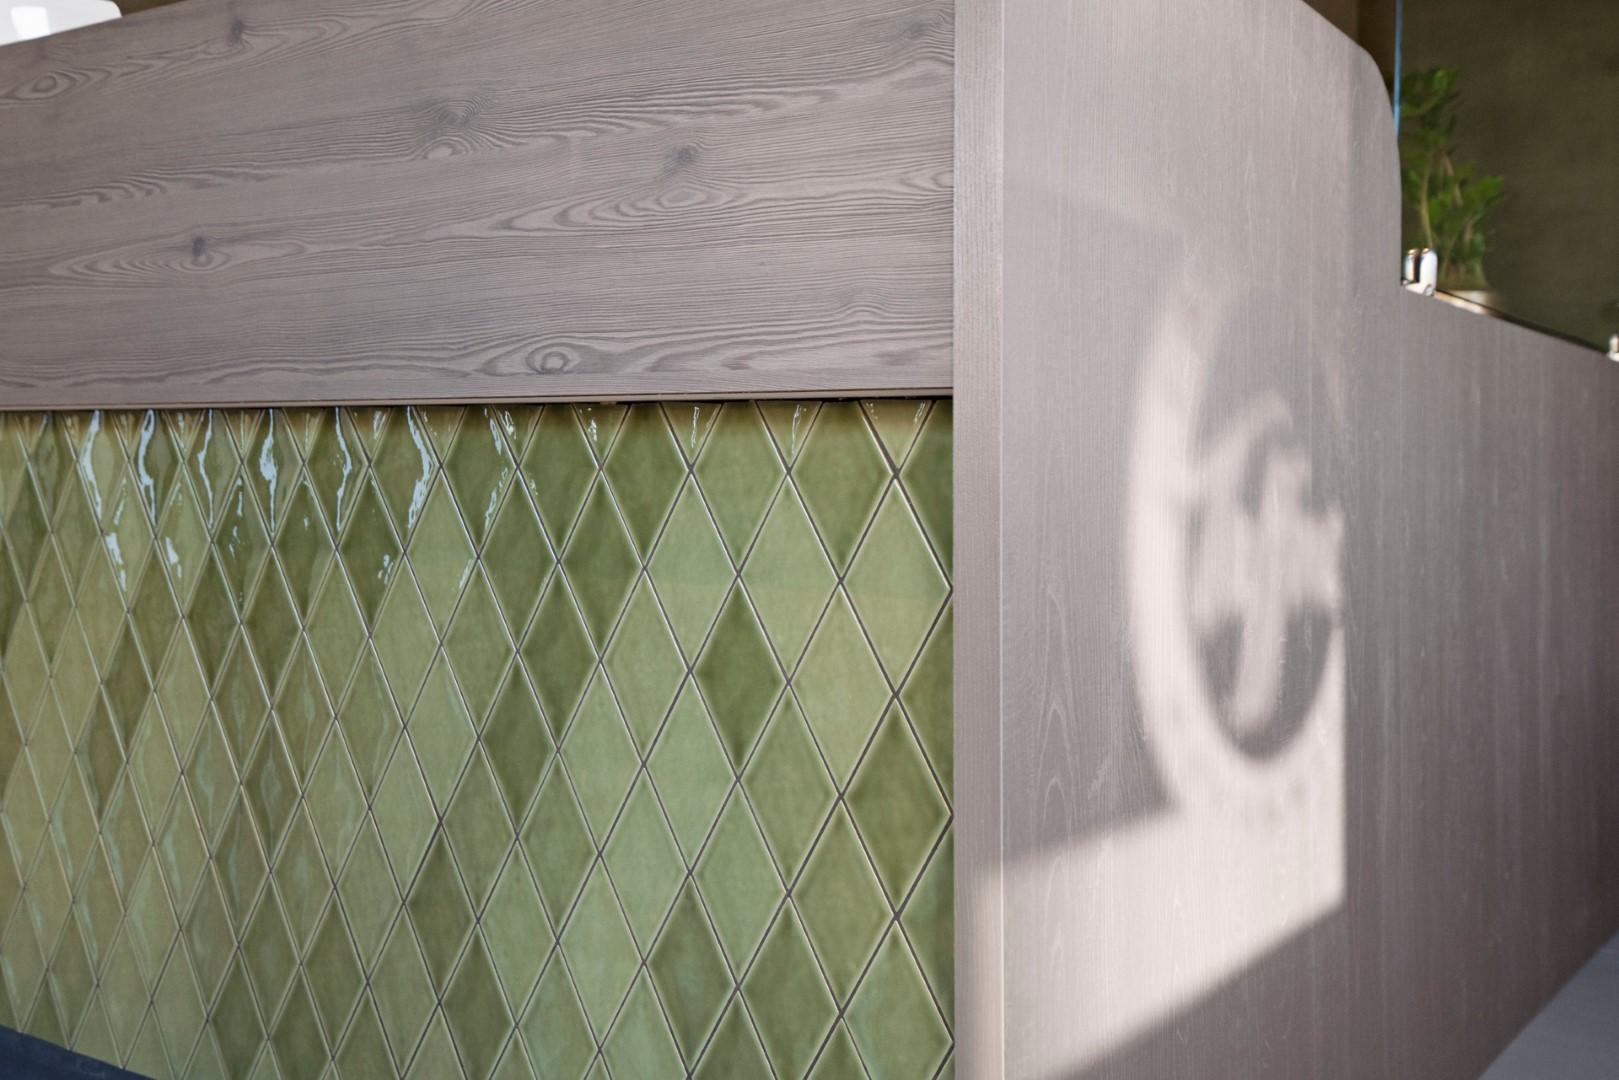 Adrichem Interieurbouw winkel balie tegels